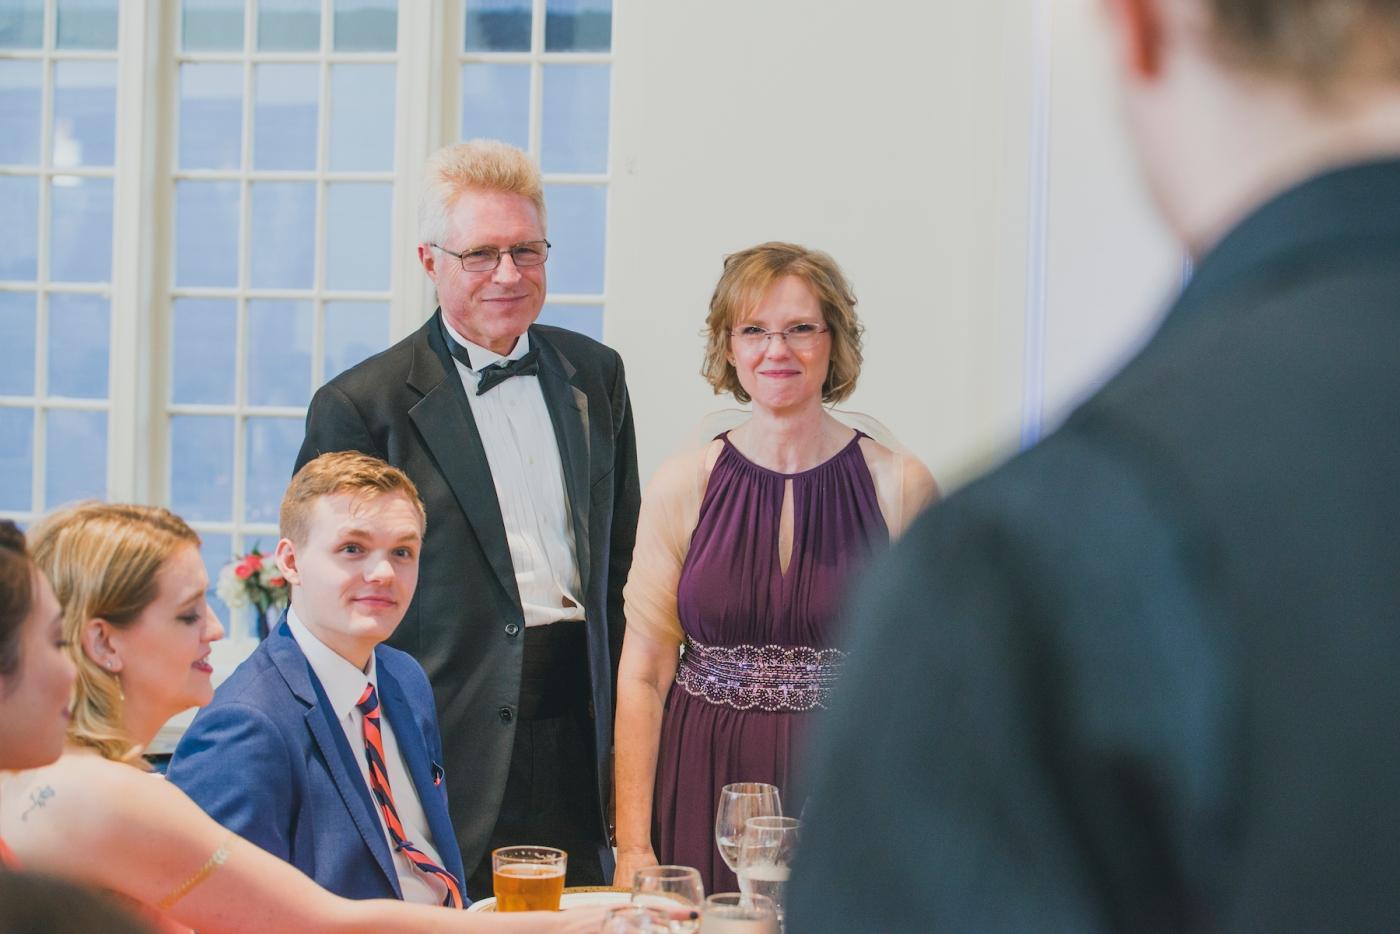 DSC_3210Everett_Wedding_Ballroom_Jane_Speleers_photography_Rachel_and_Edmund_reception_2017